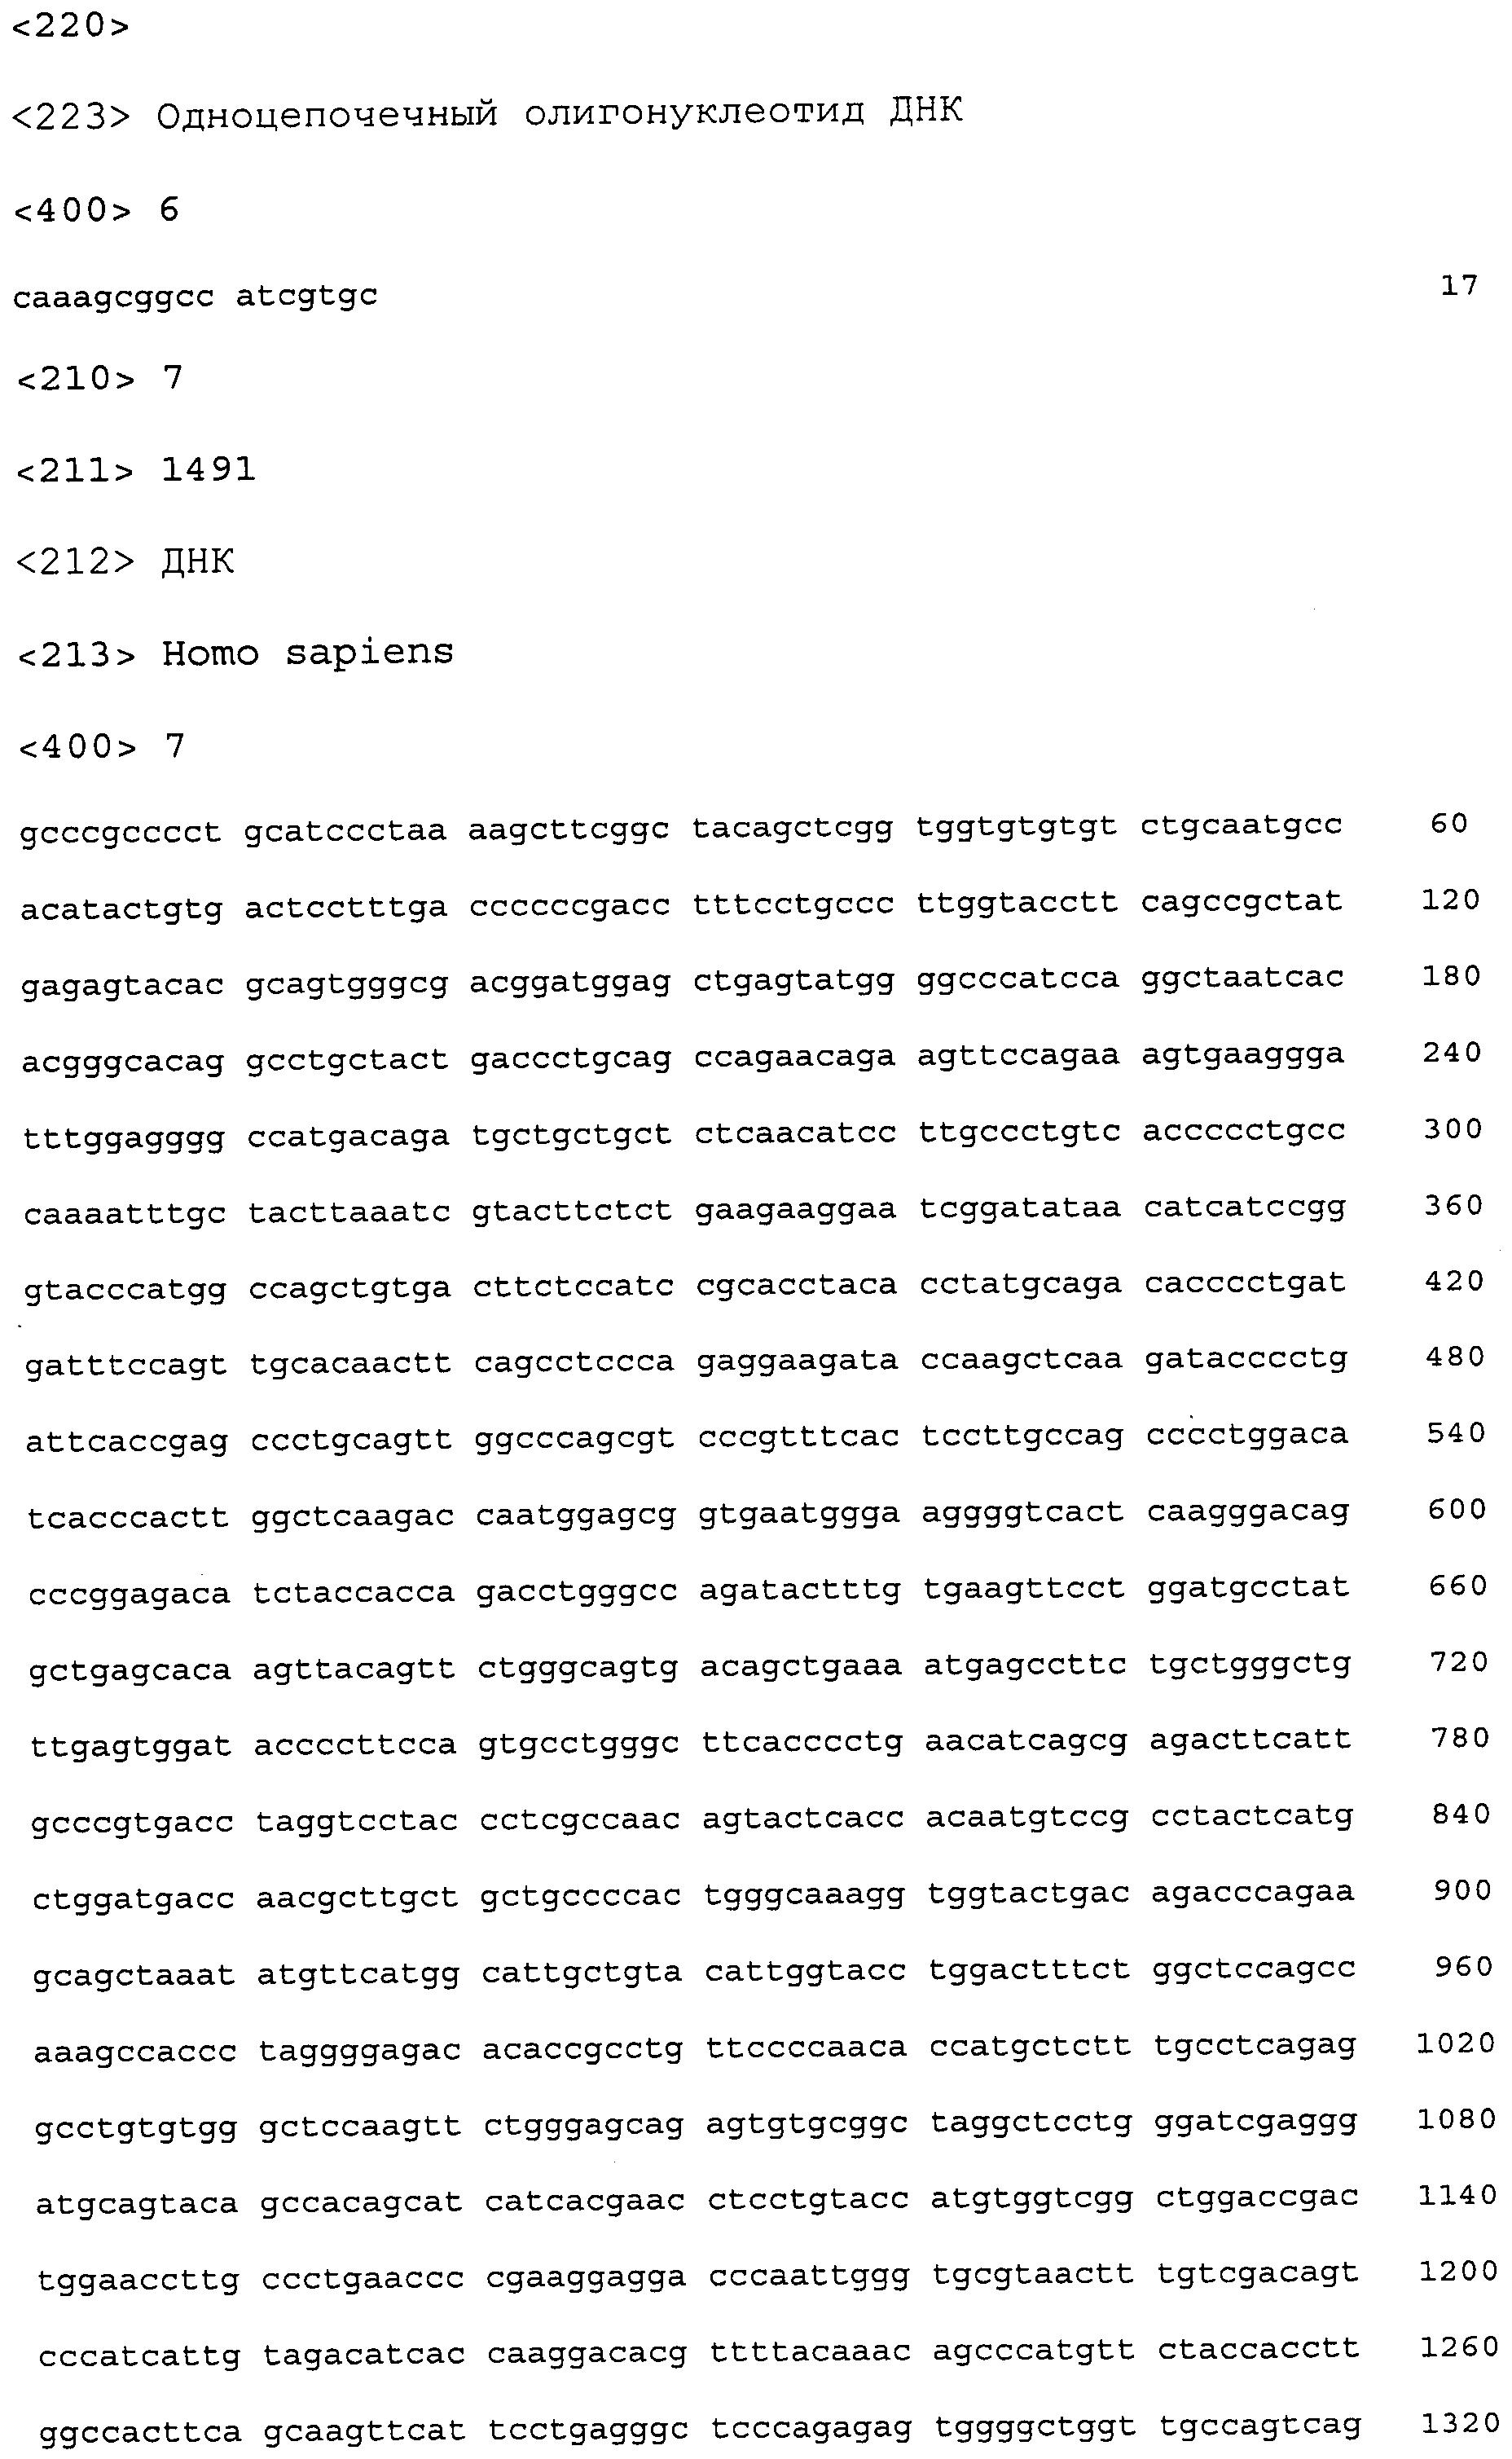 Пептиды блокирующие белок rsk аналог кленбутерола